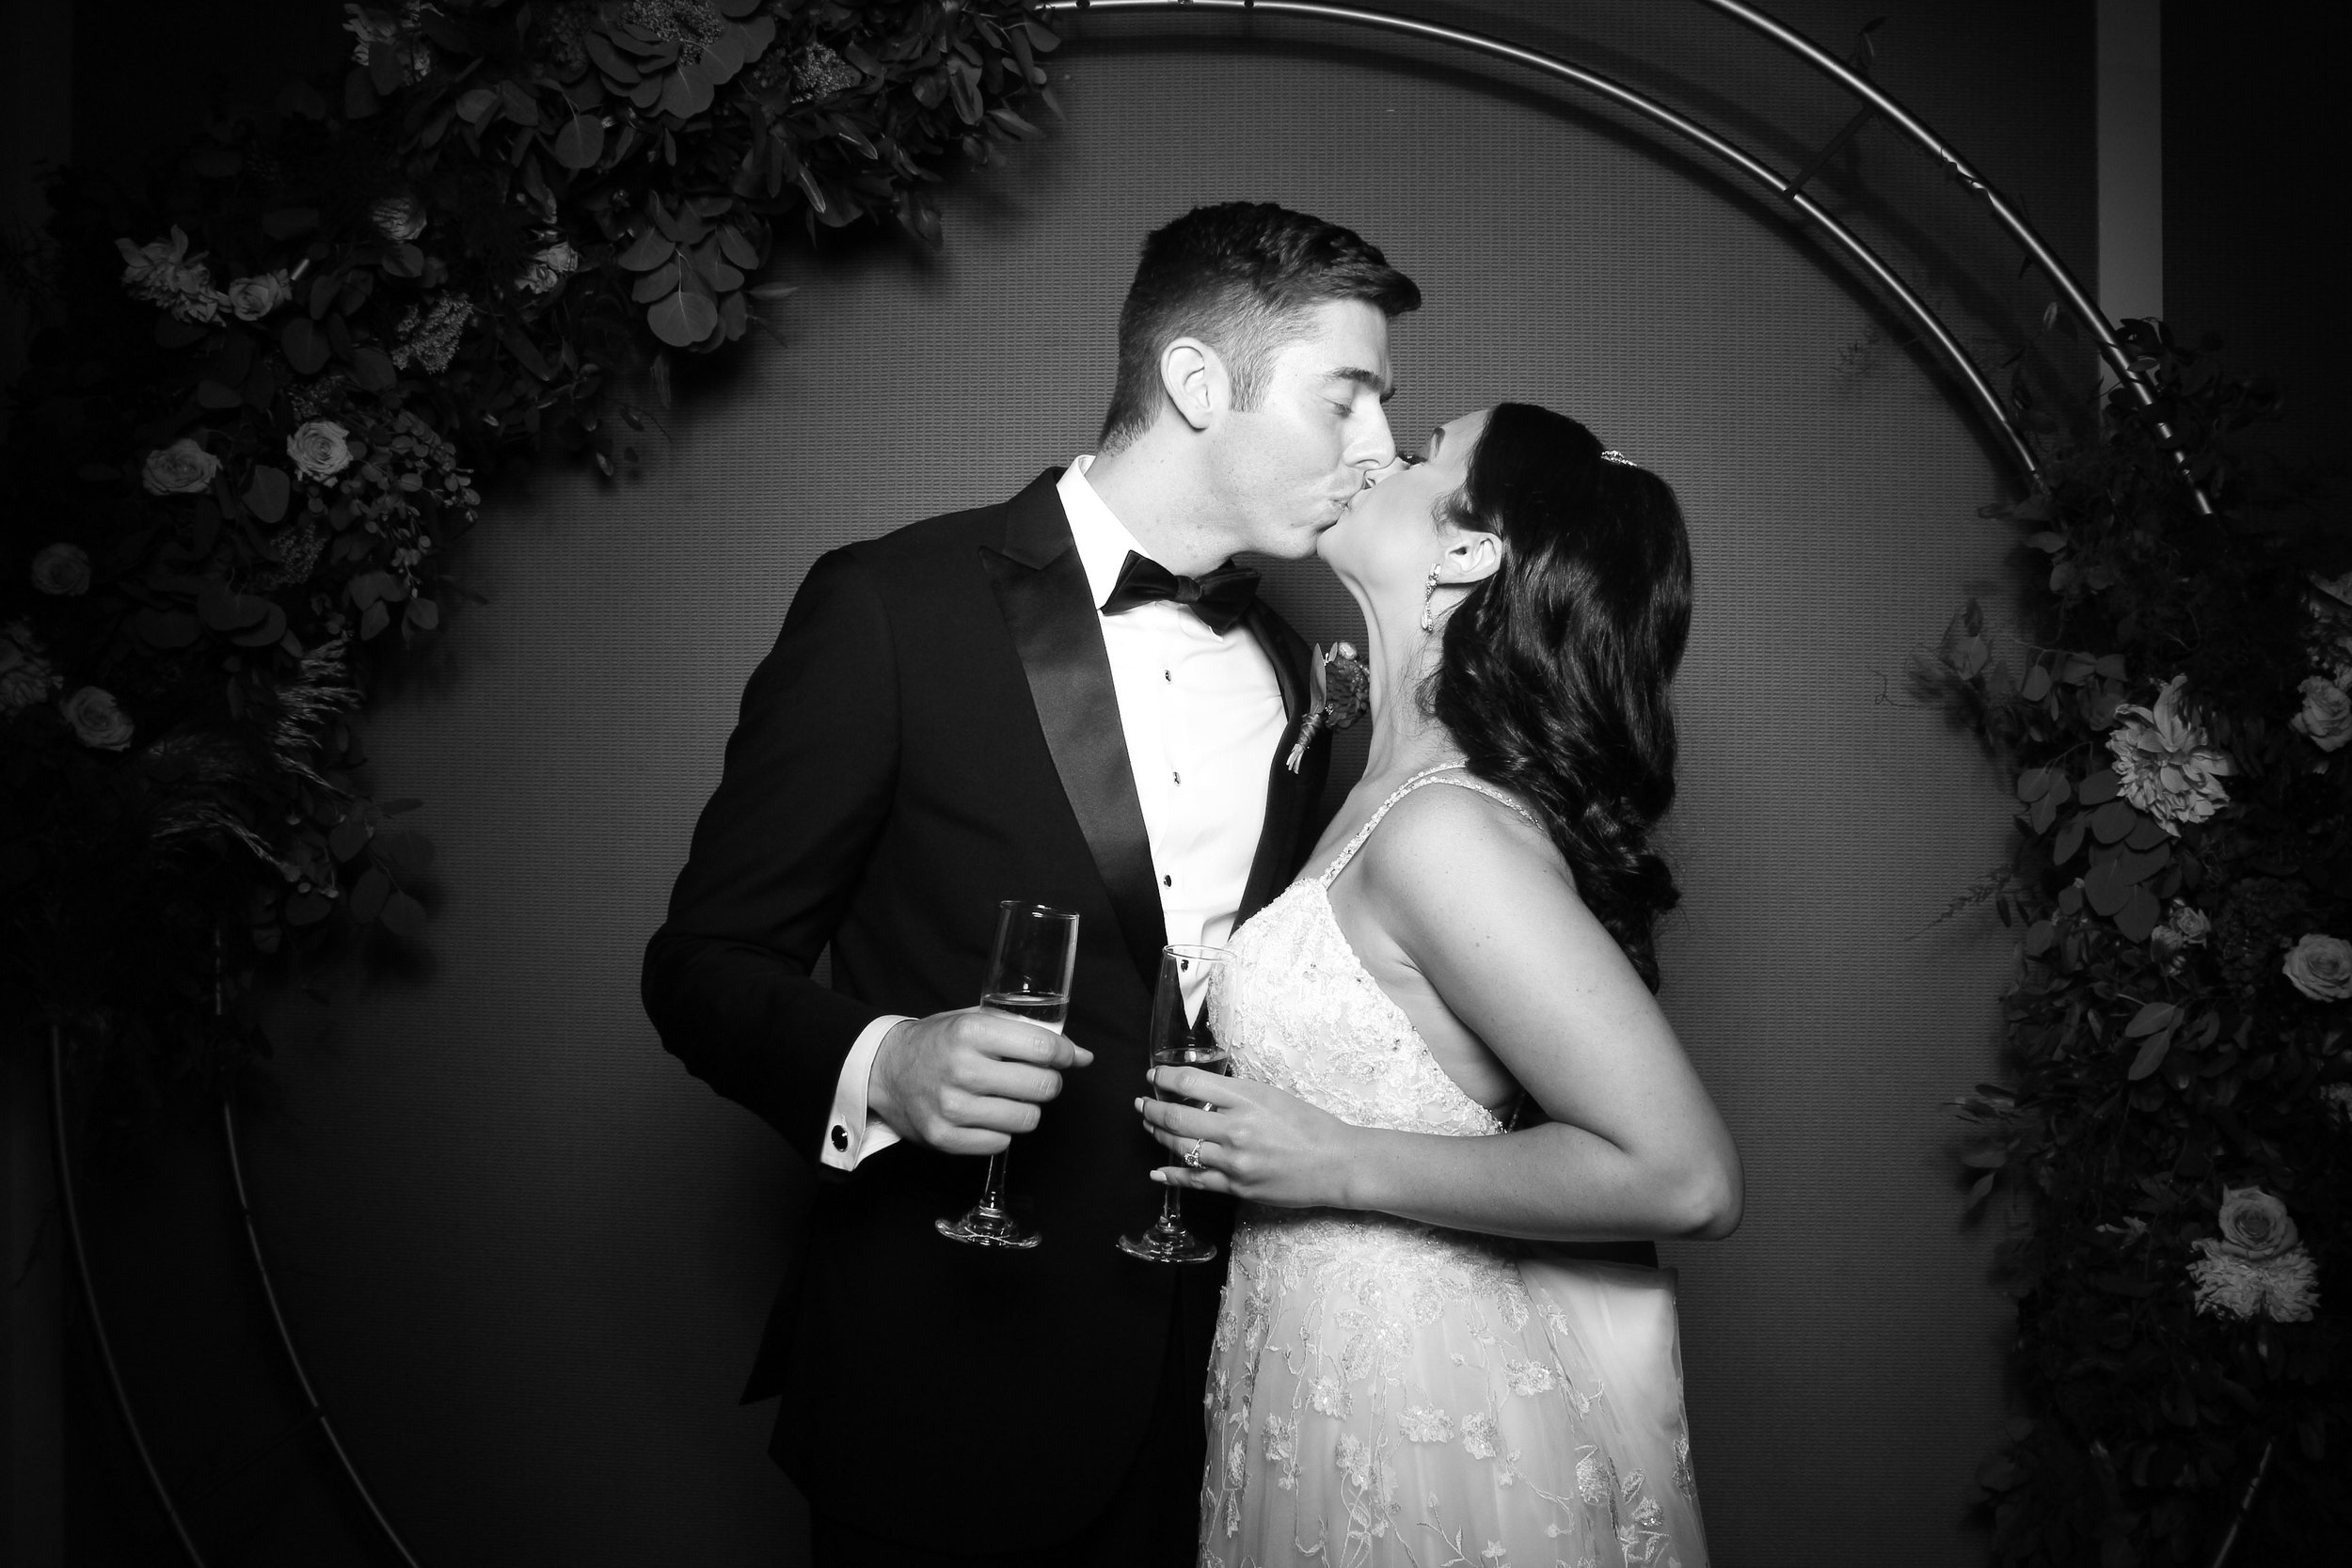 Metropolis_Ballroom_Wedding_Arlington_Heights_Photo_Booth_02.jpg